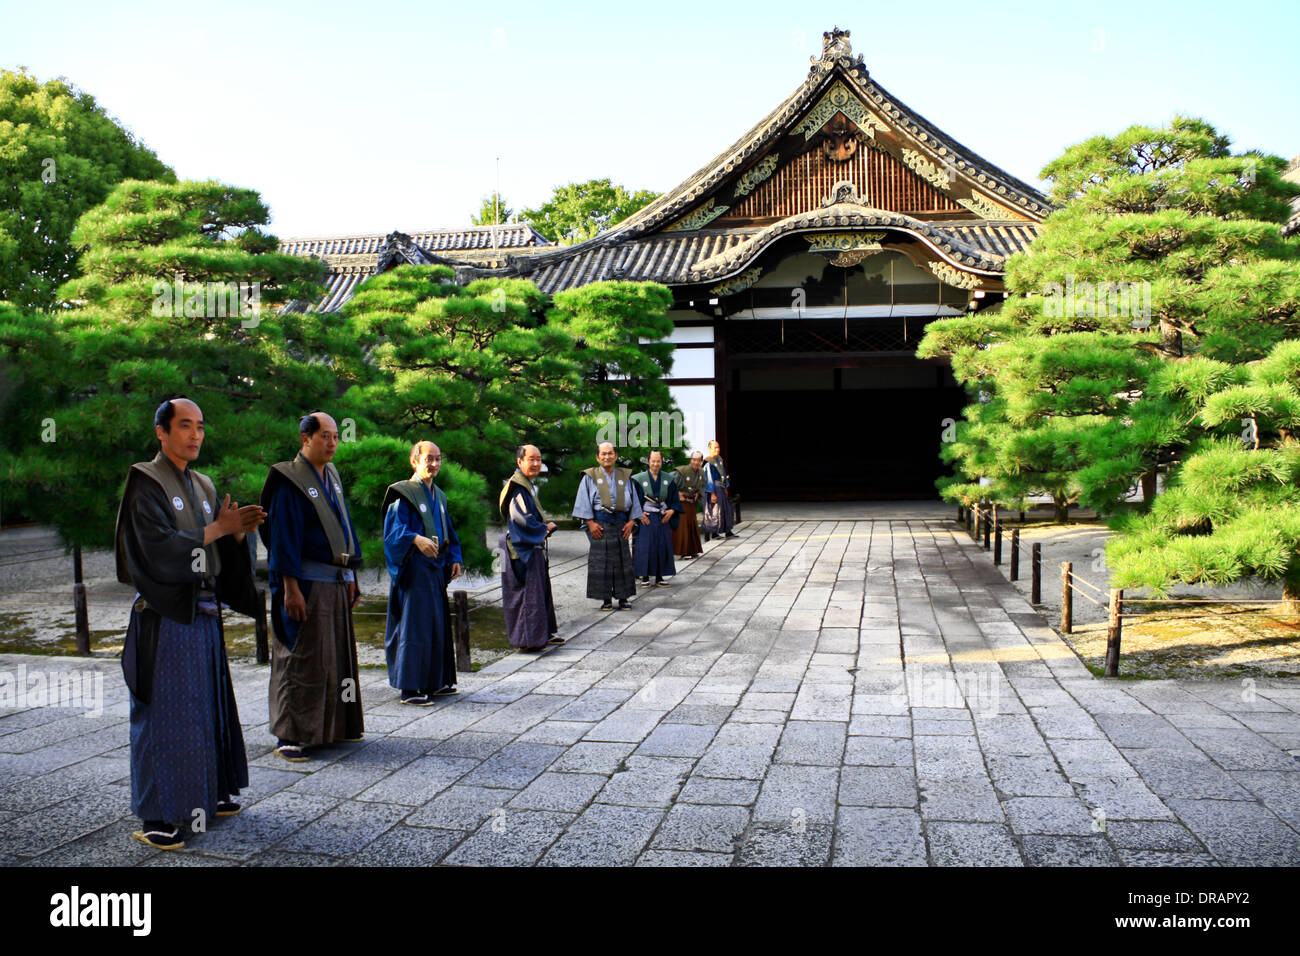 A Samurai setting and atmosphere at Nishi Honganji temple, Kyoto Stock Photo,...